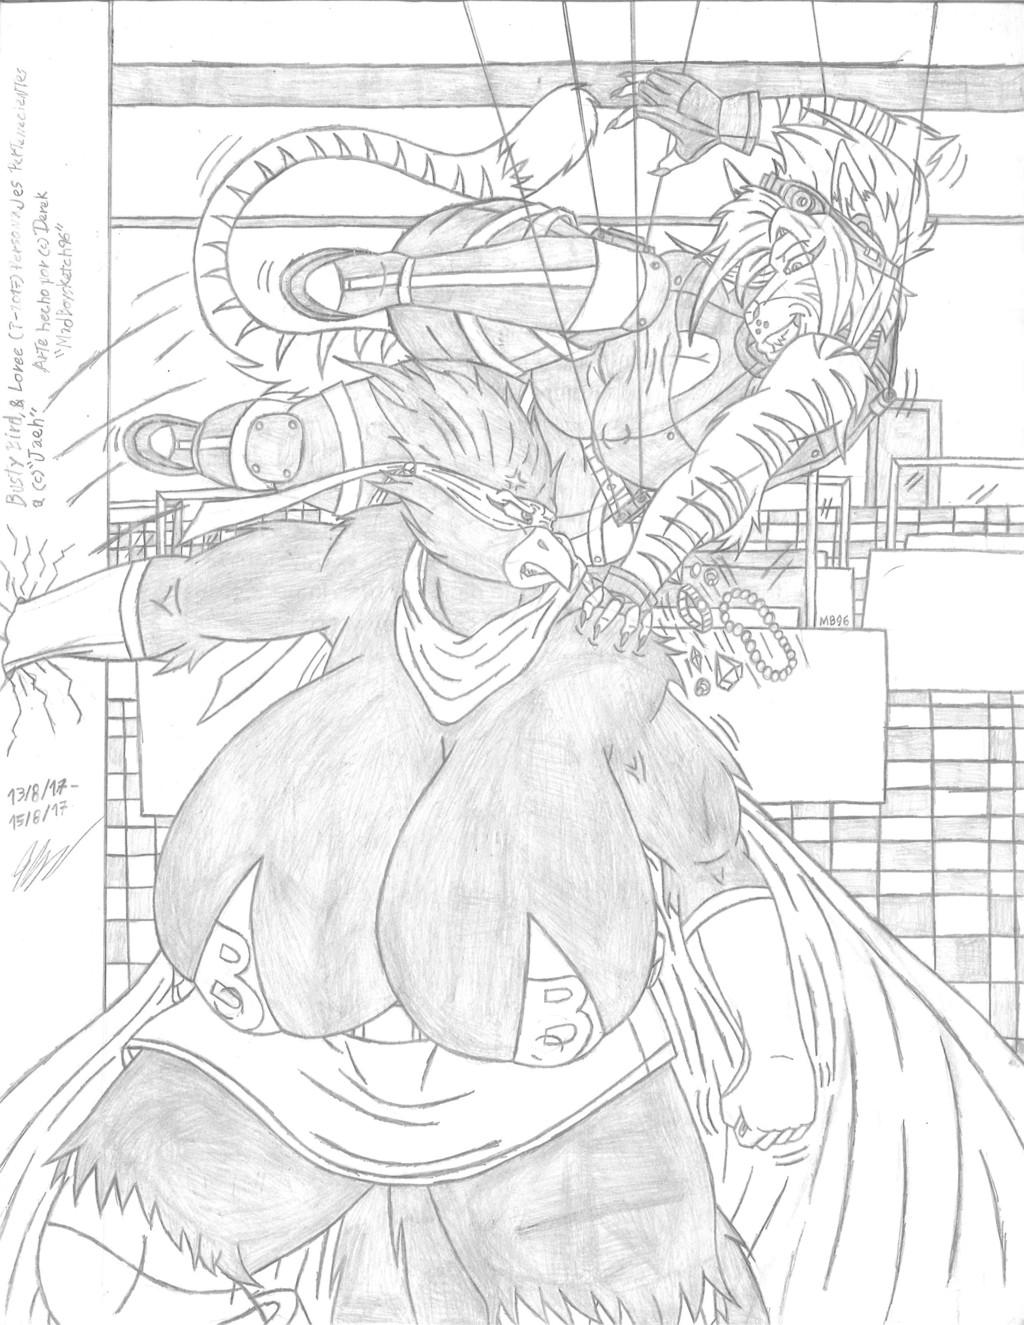 Busty Bird vs Loree (Jaeh s Gift) - Sketch